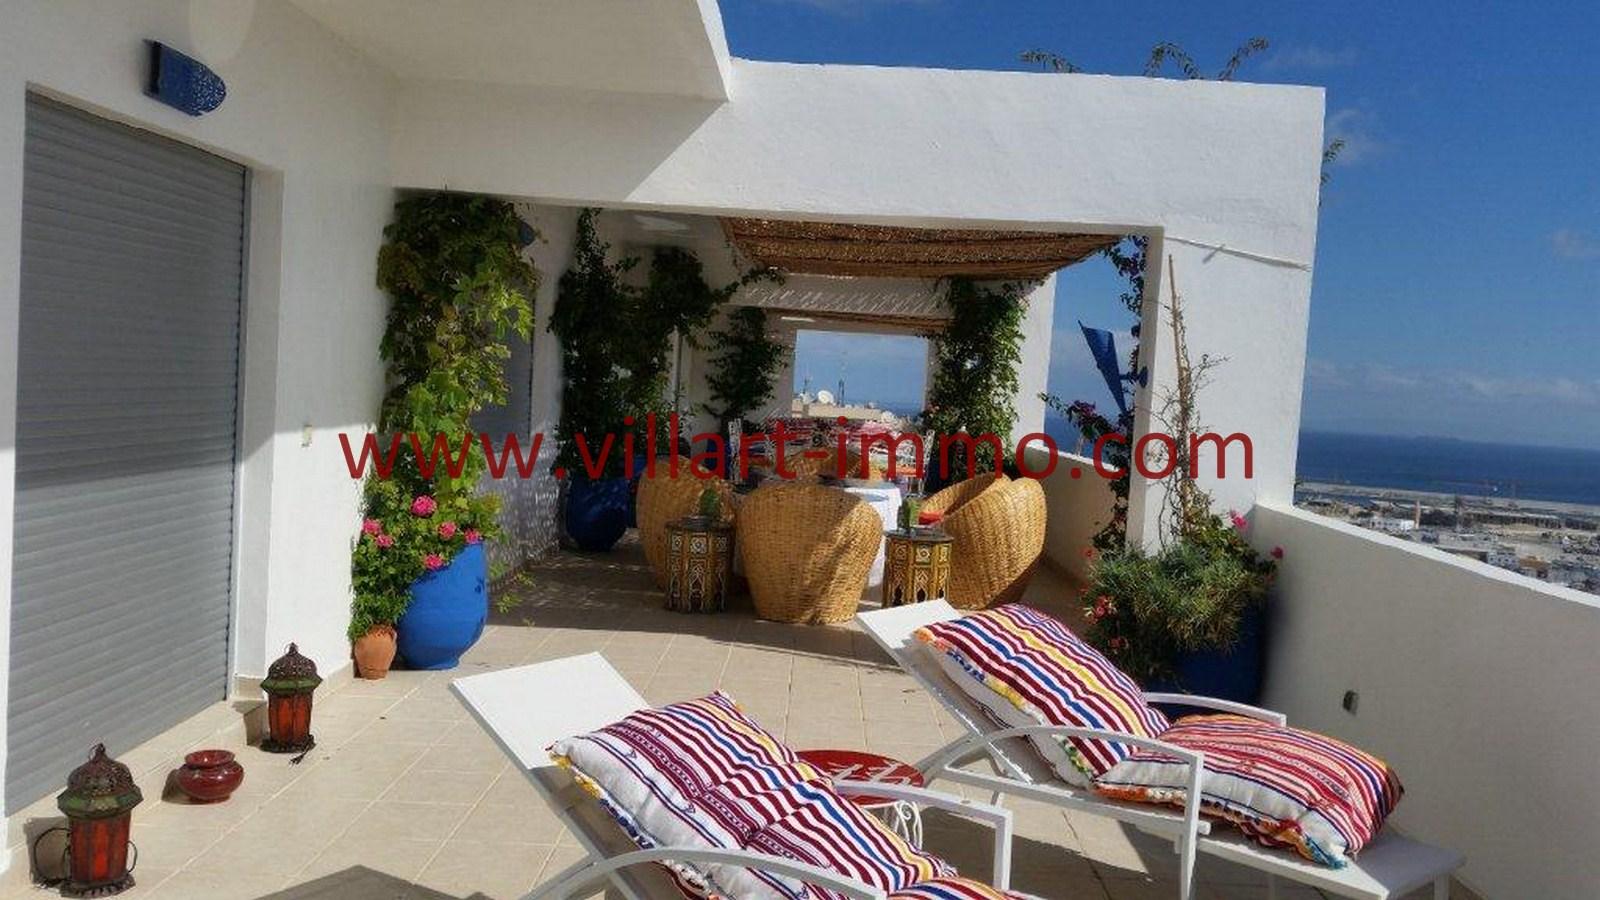 4-Vente-Appartement-Tanger-Centre-De-Ville-Terrasse 4-VA502-Villart Immo